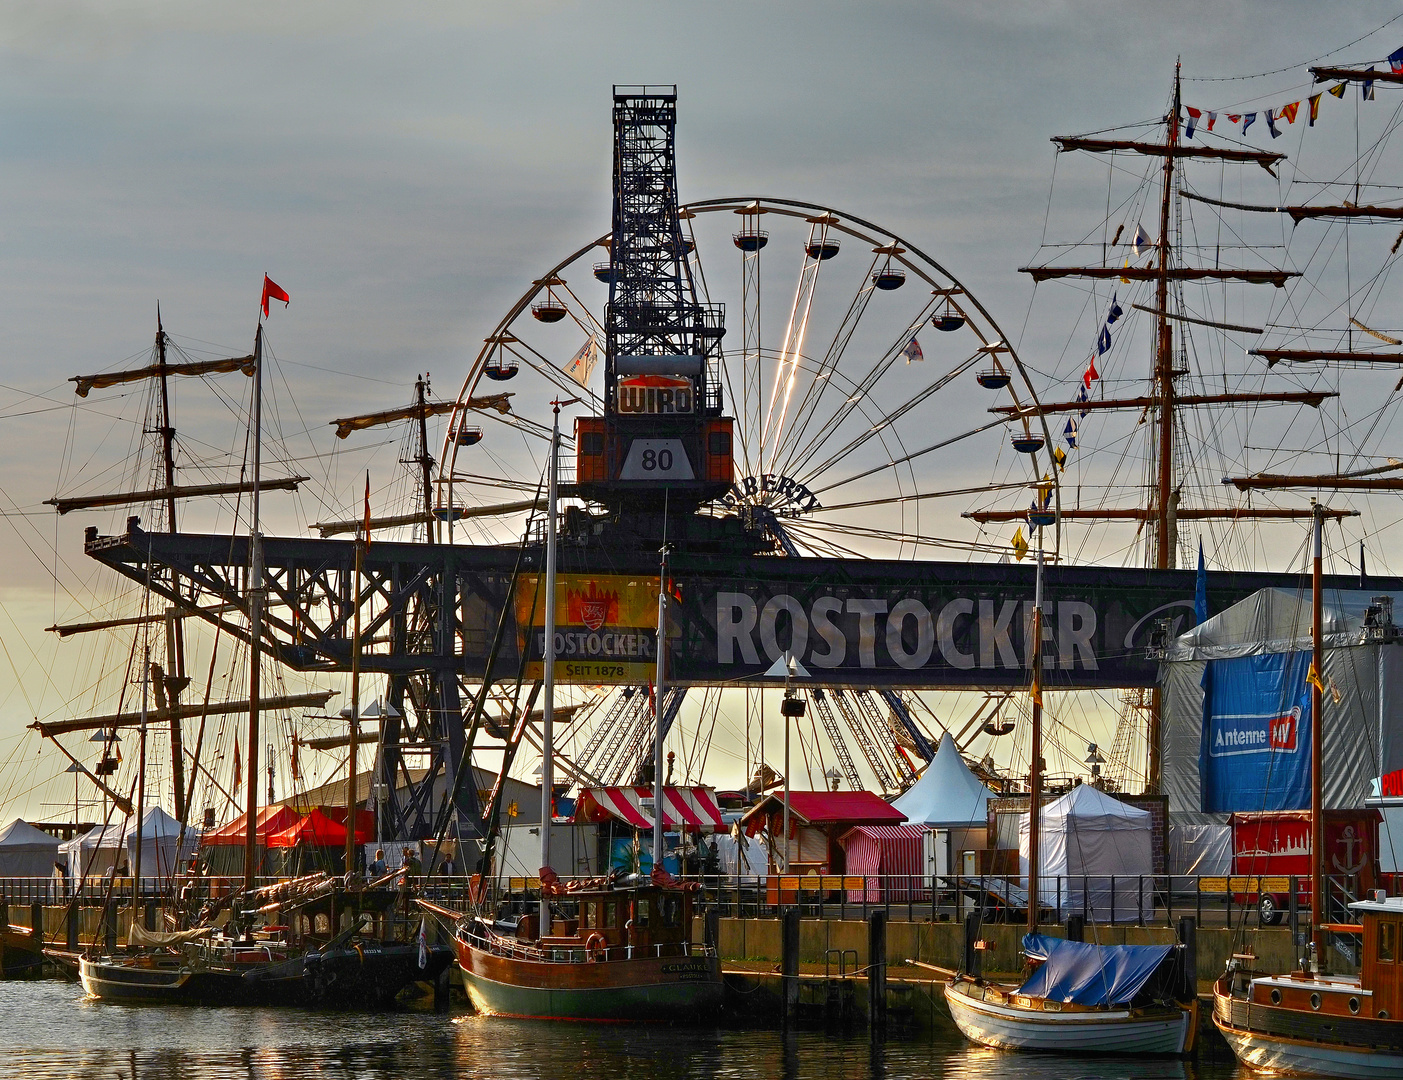 29. Hanse Sail Rostock